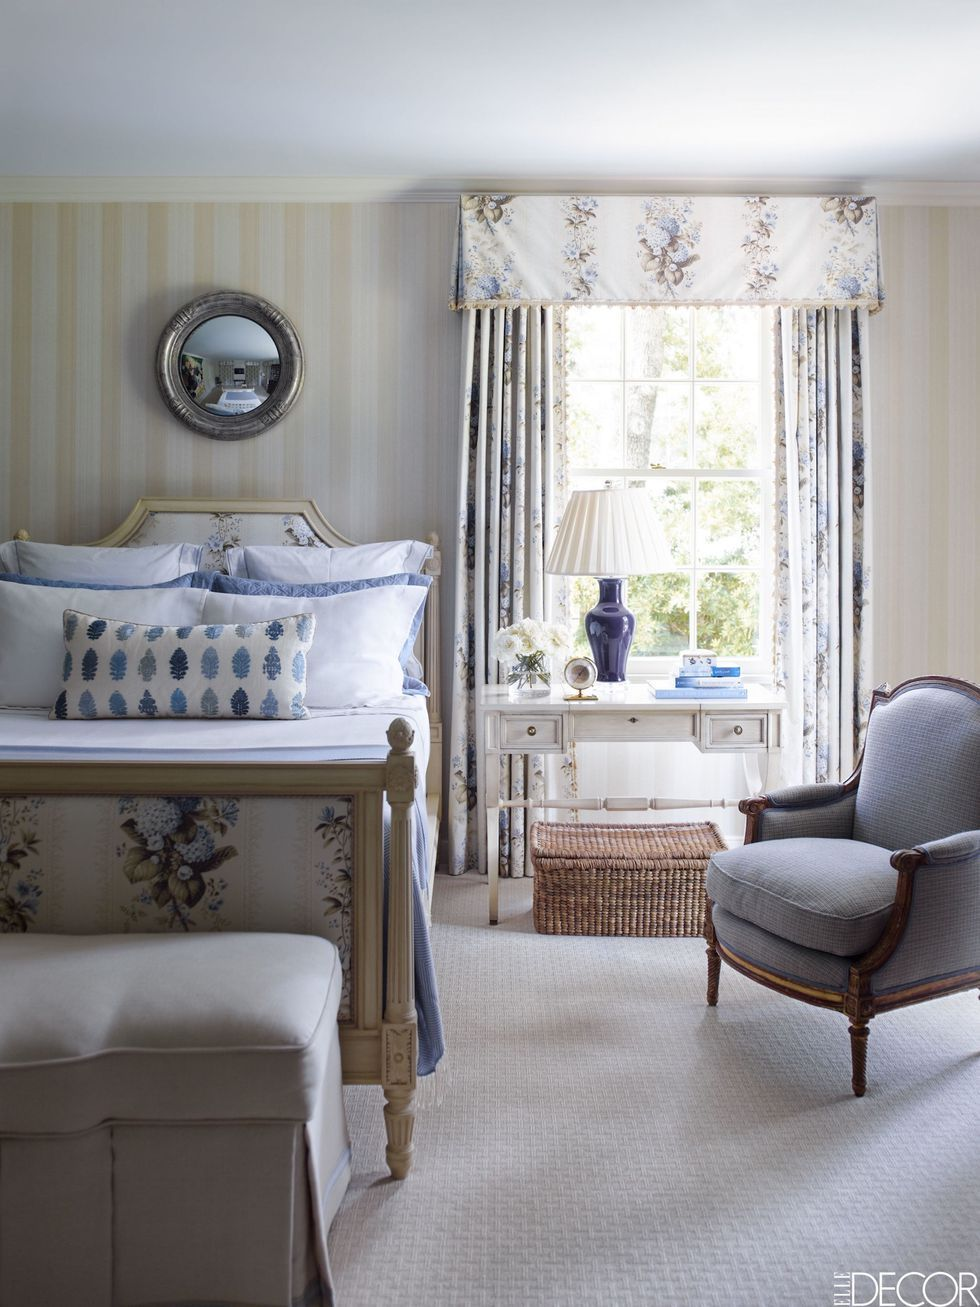 Best Bedroom Curtains - Ideas for Bedroom Window Treatments on Master Bedroom Curtains  id=98136